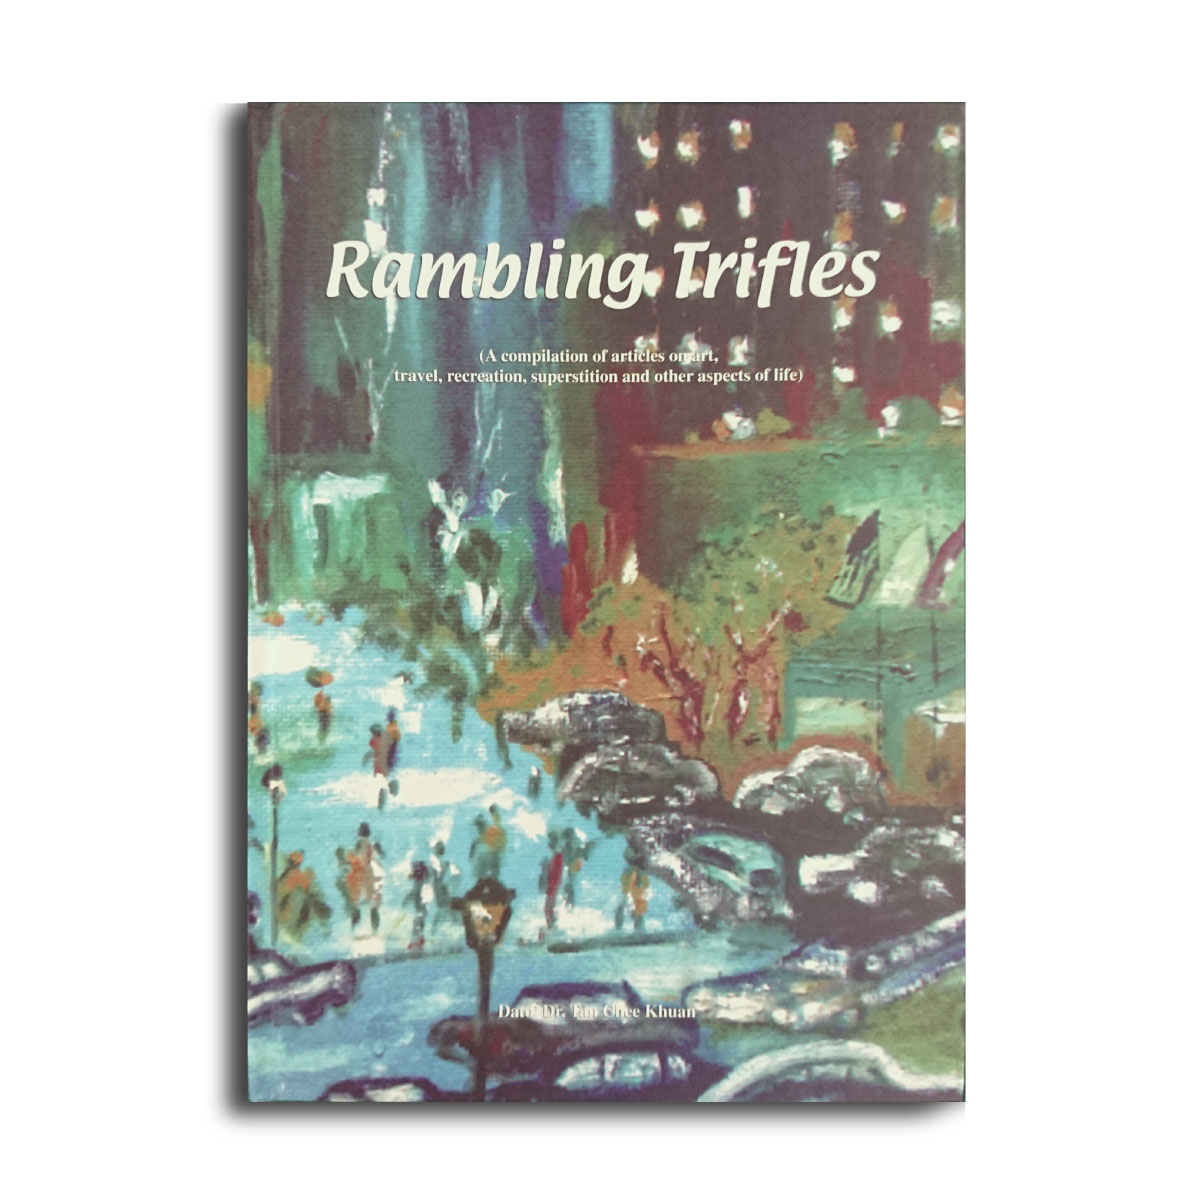 Rambling Trifles